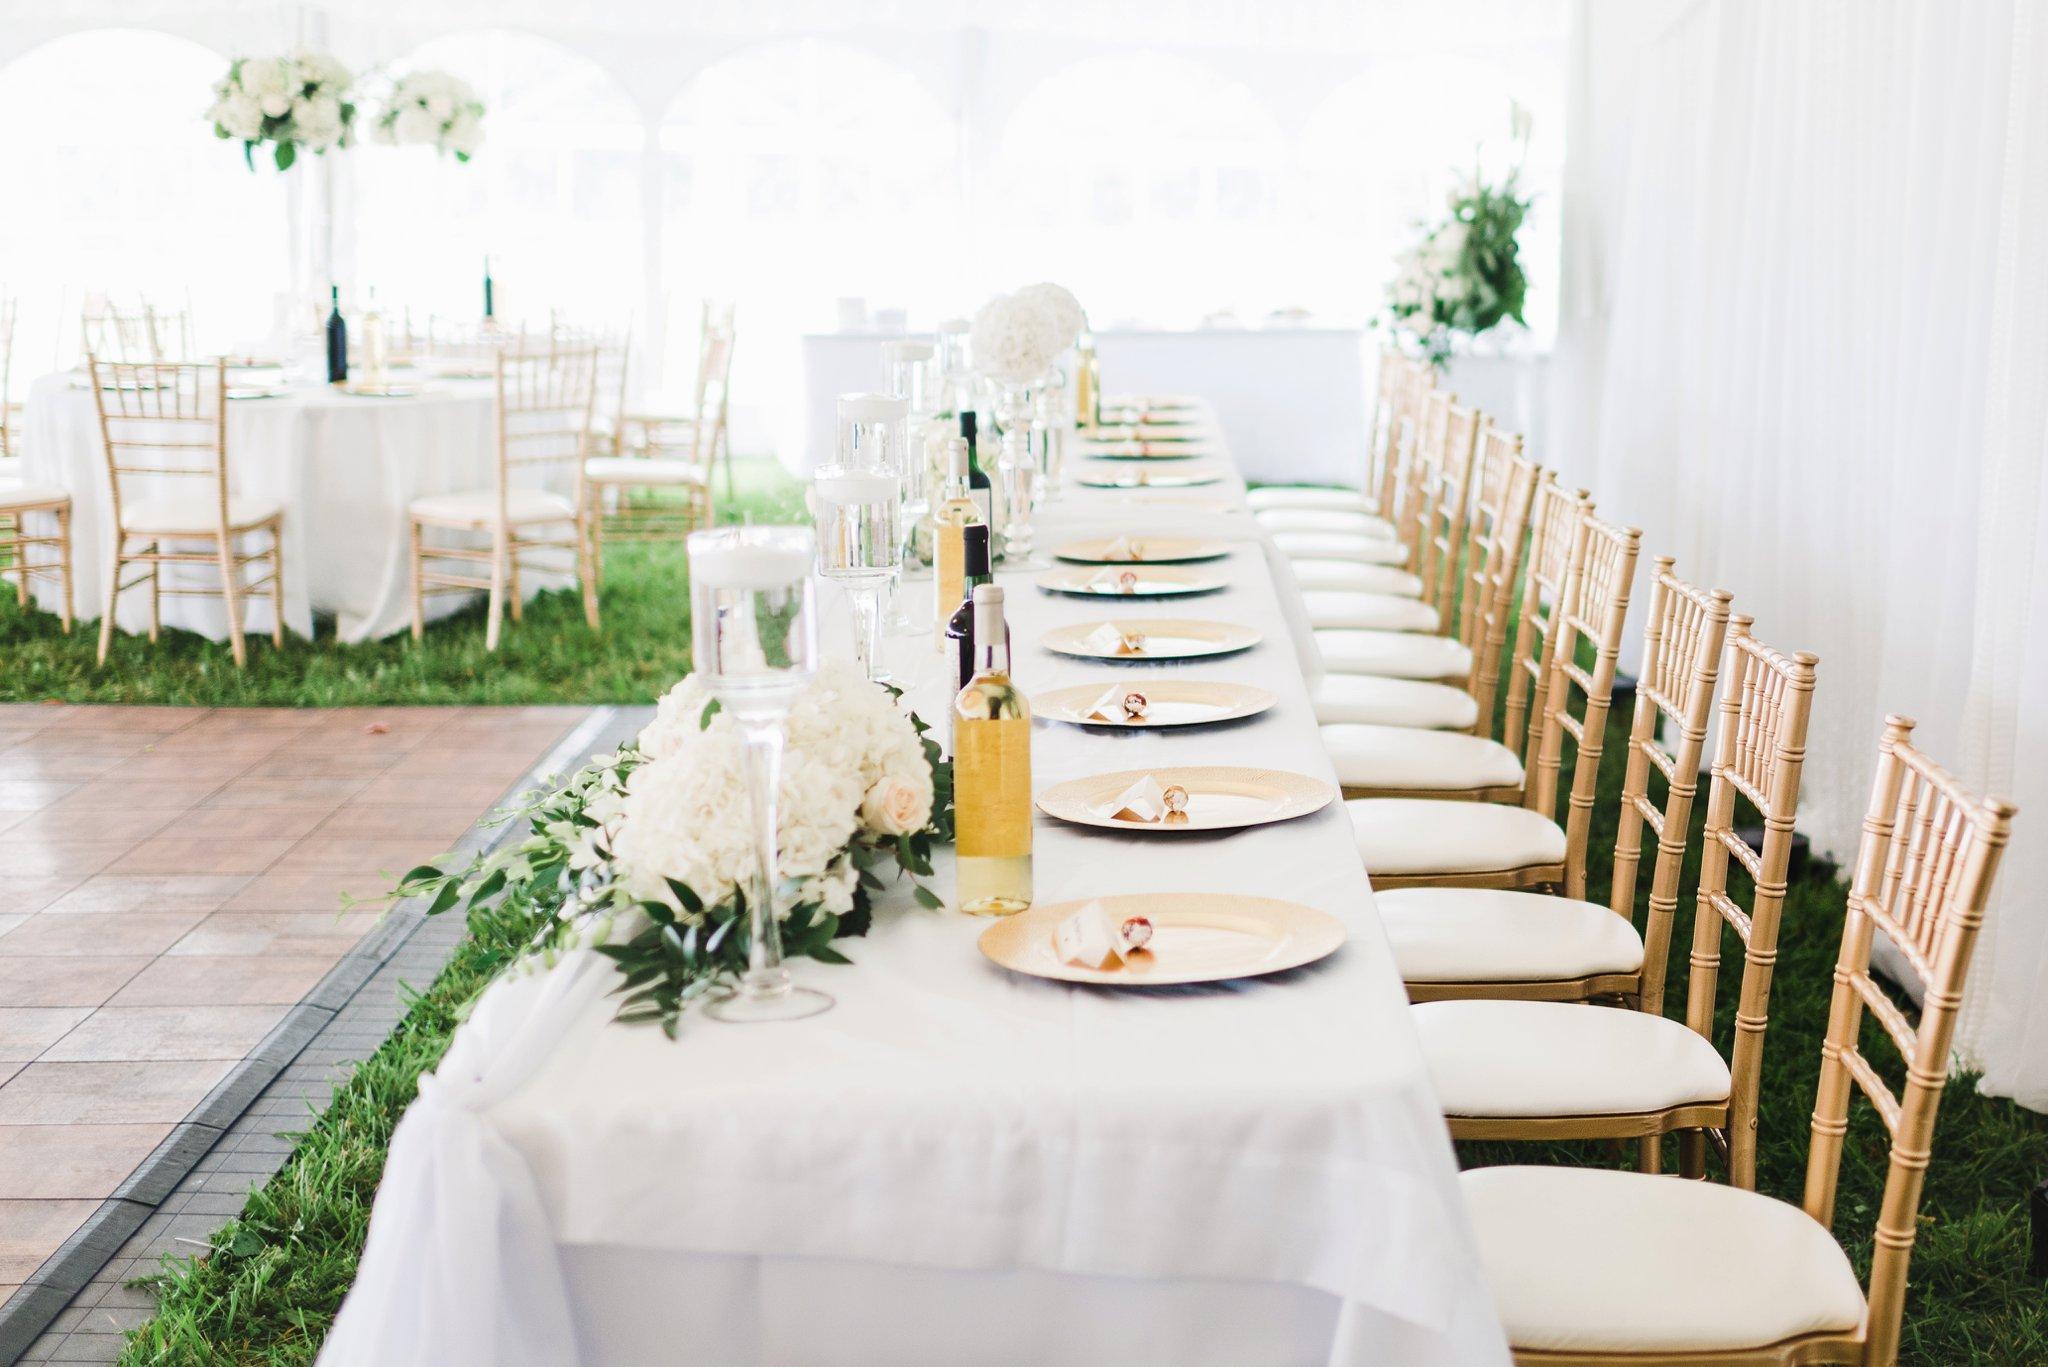 Gold chiavari chairs under the white wedding tent at the alpaca farm wedding